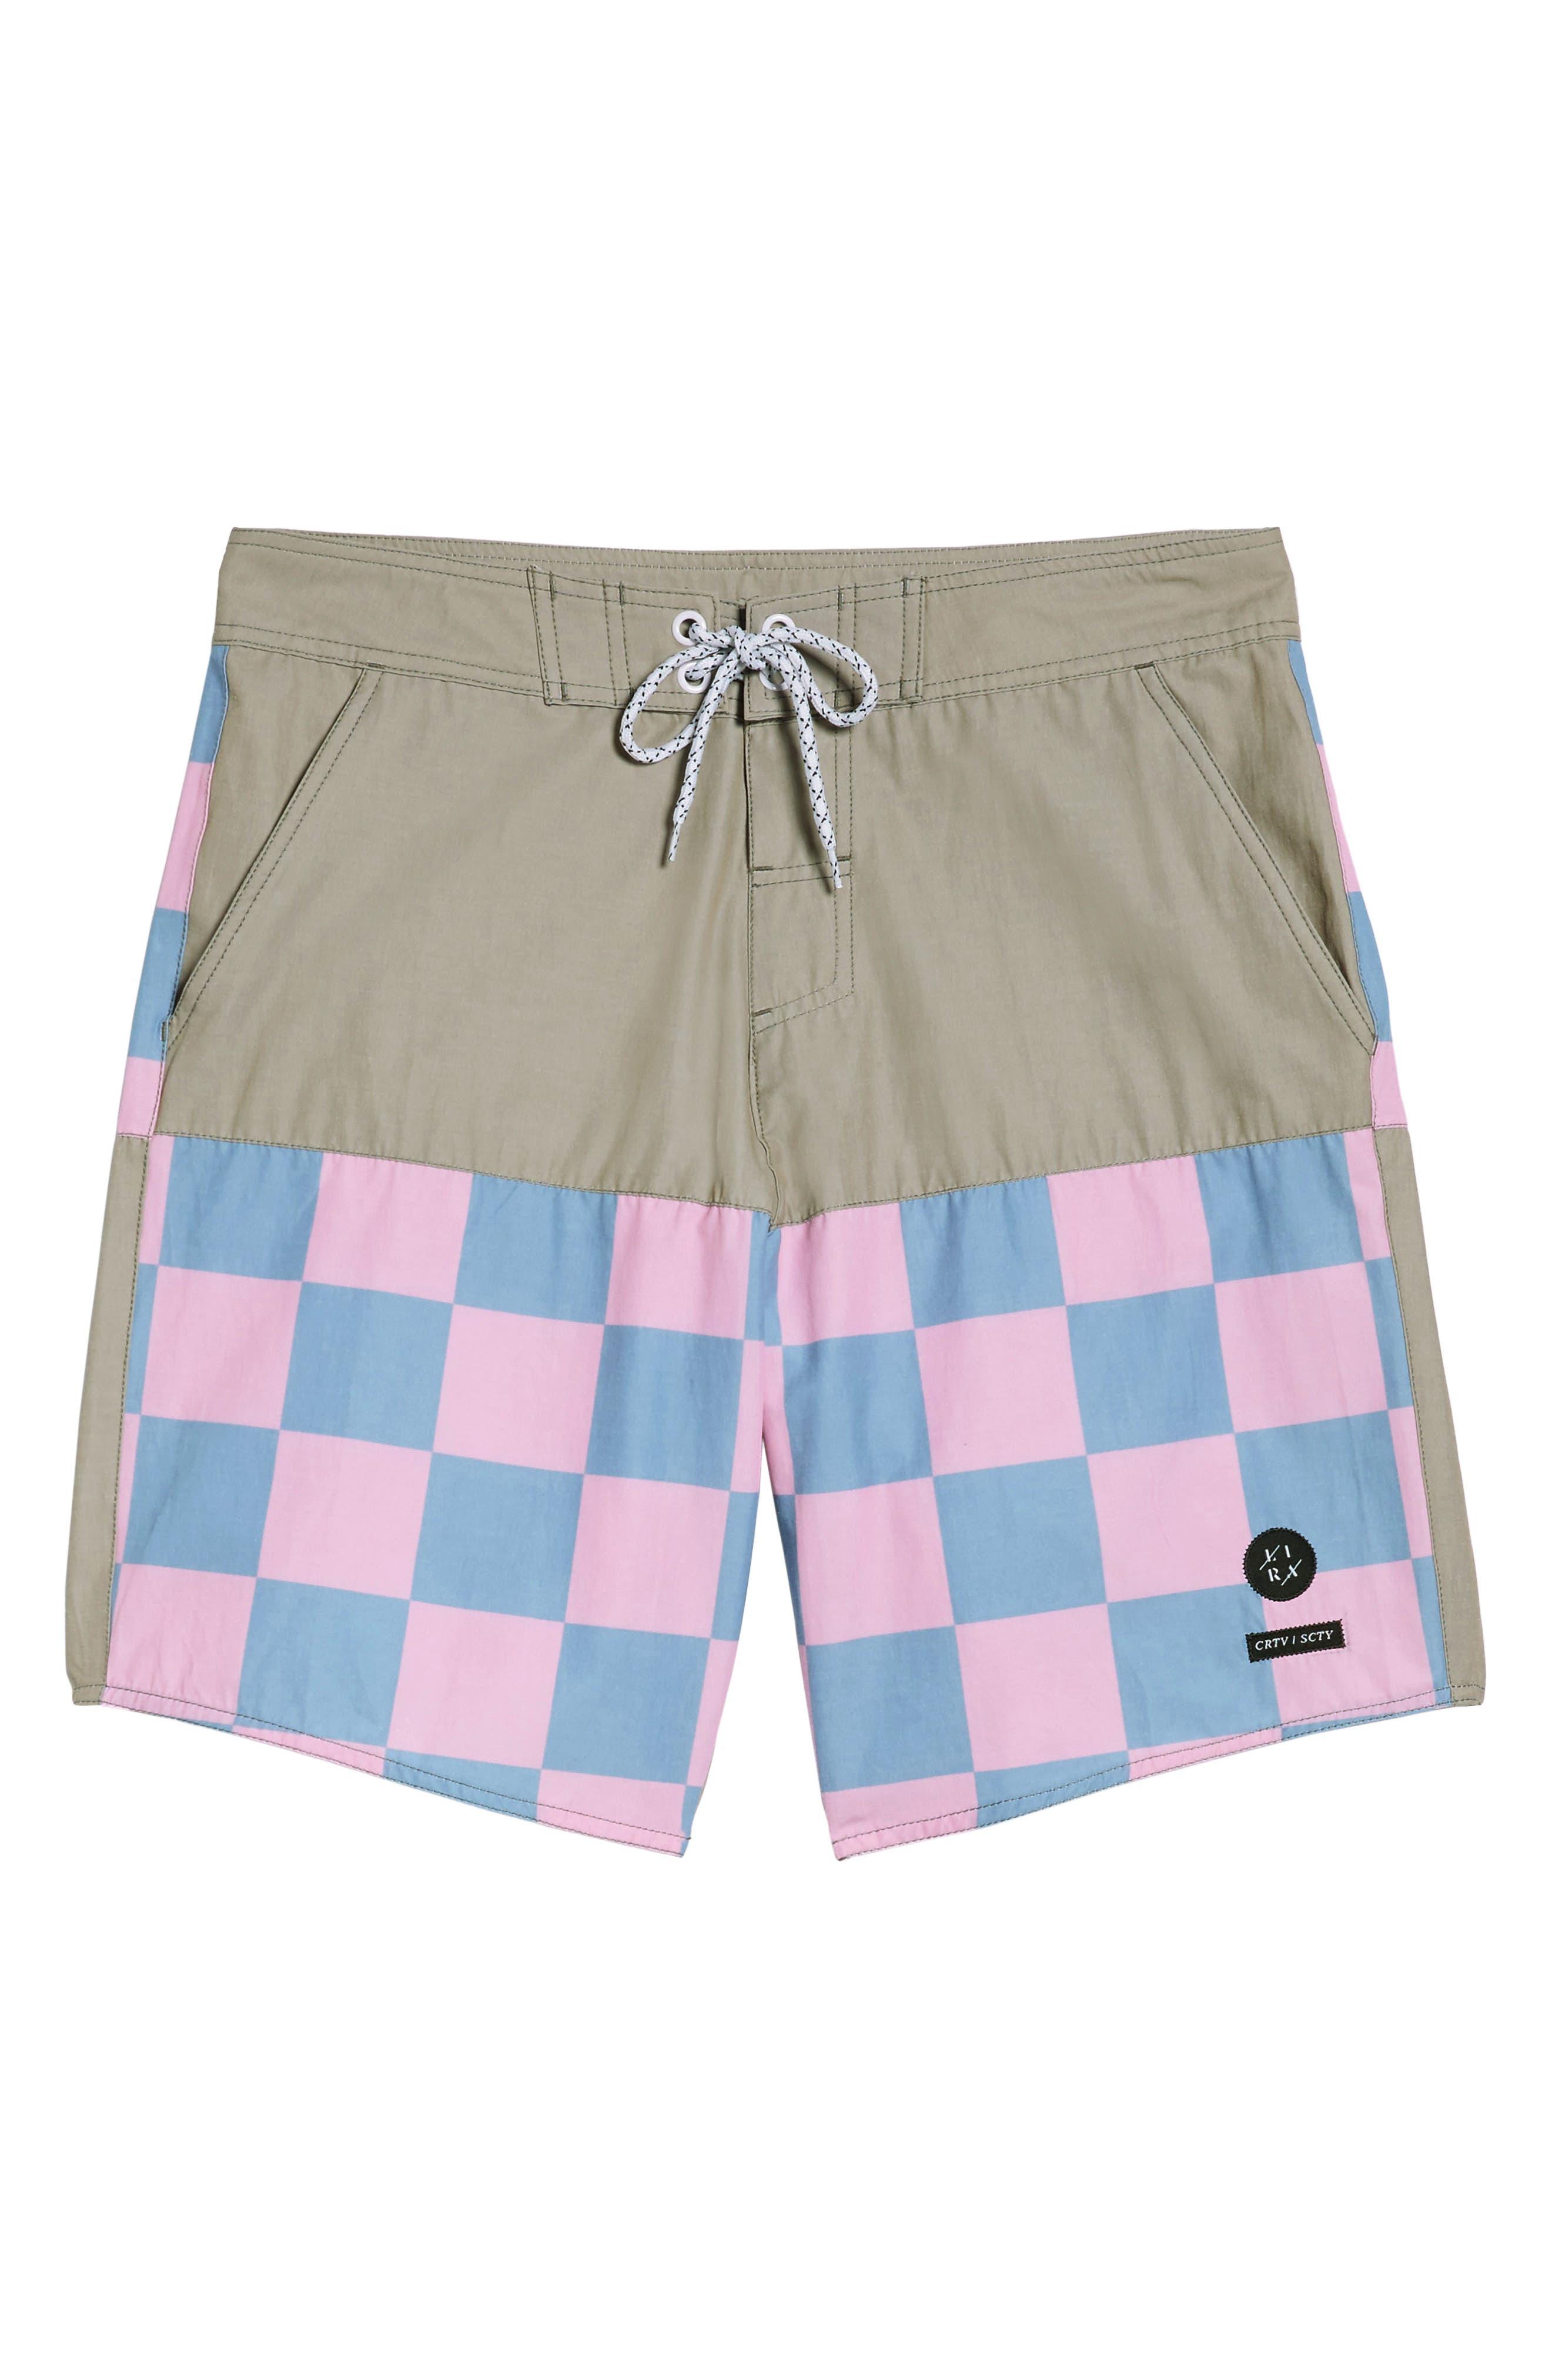 Checkered Board Shorts,                             Alternate thumbnail 6, color,                             Khaki